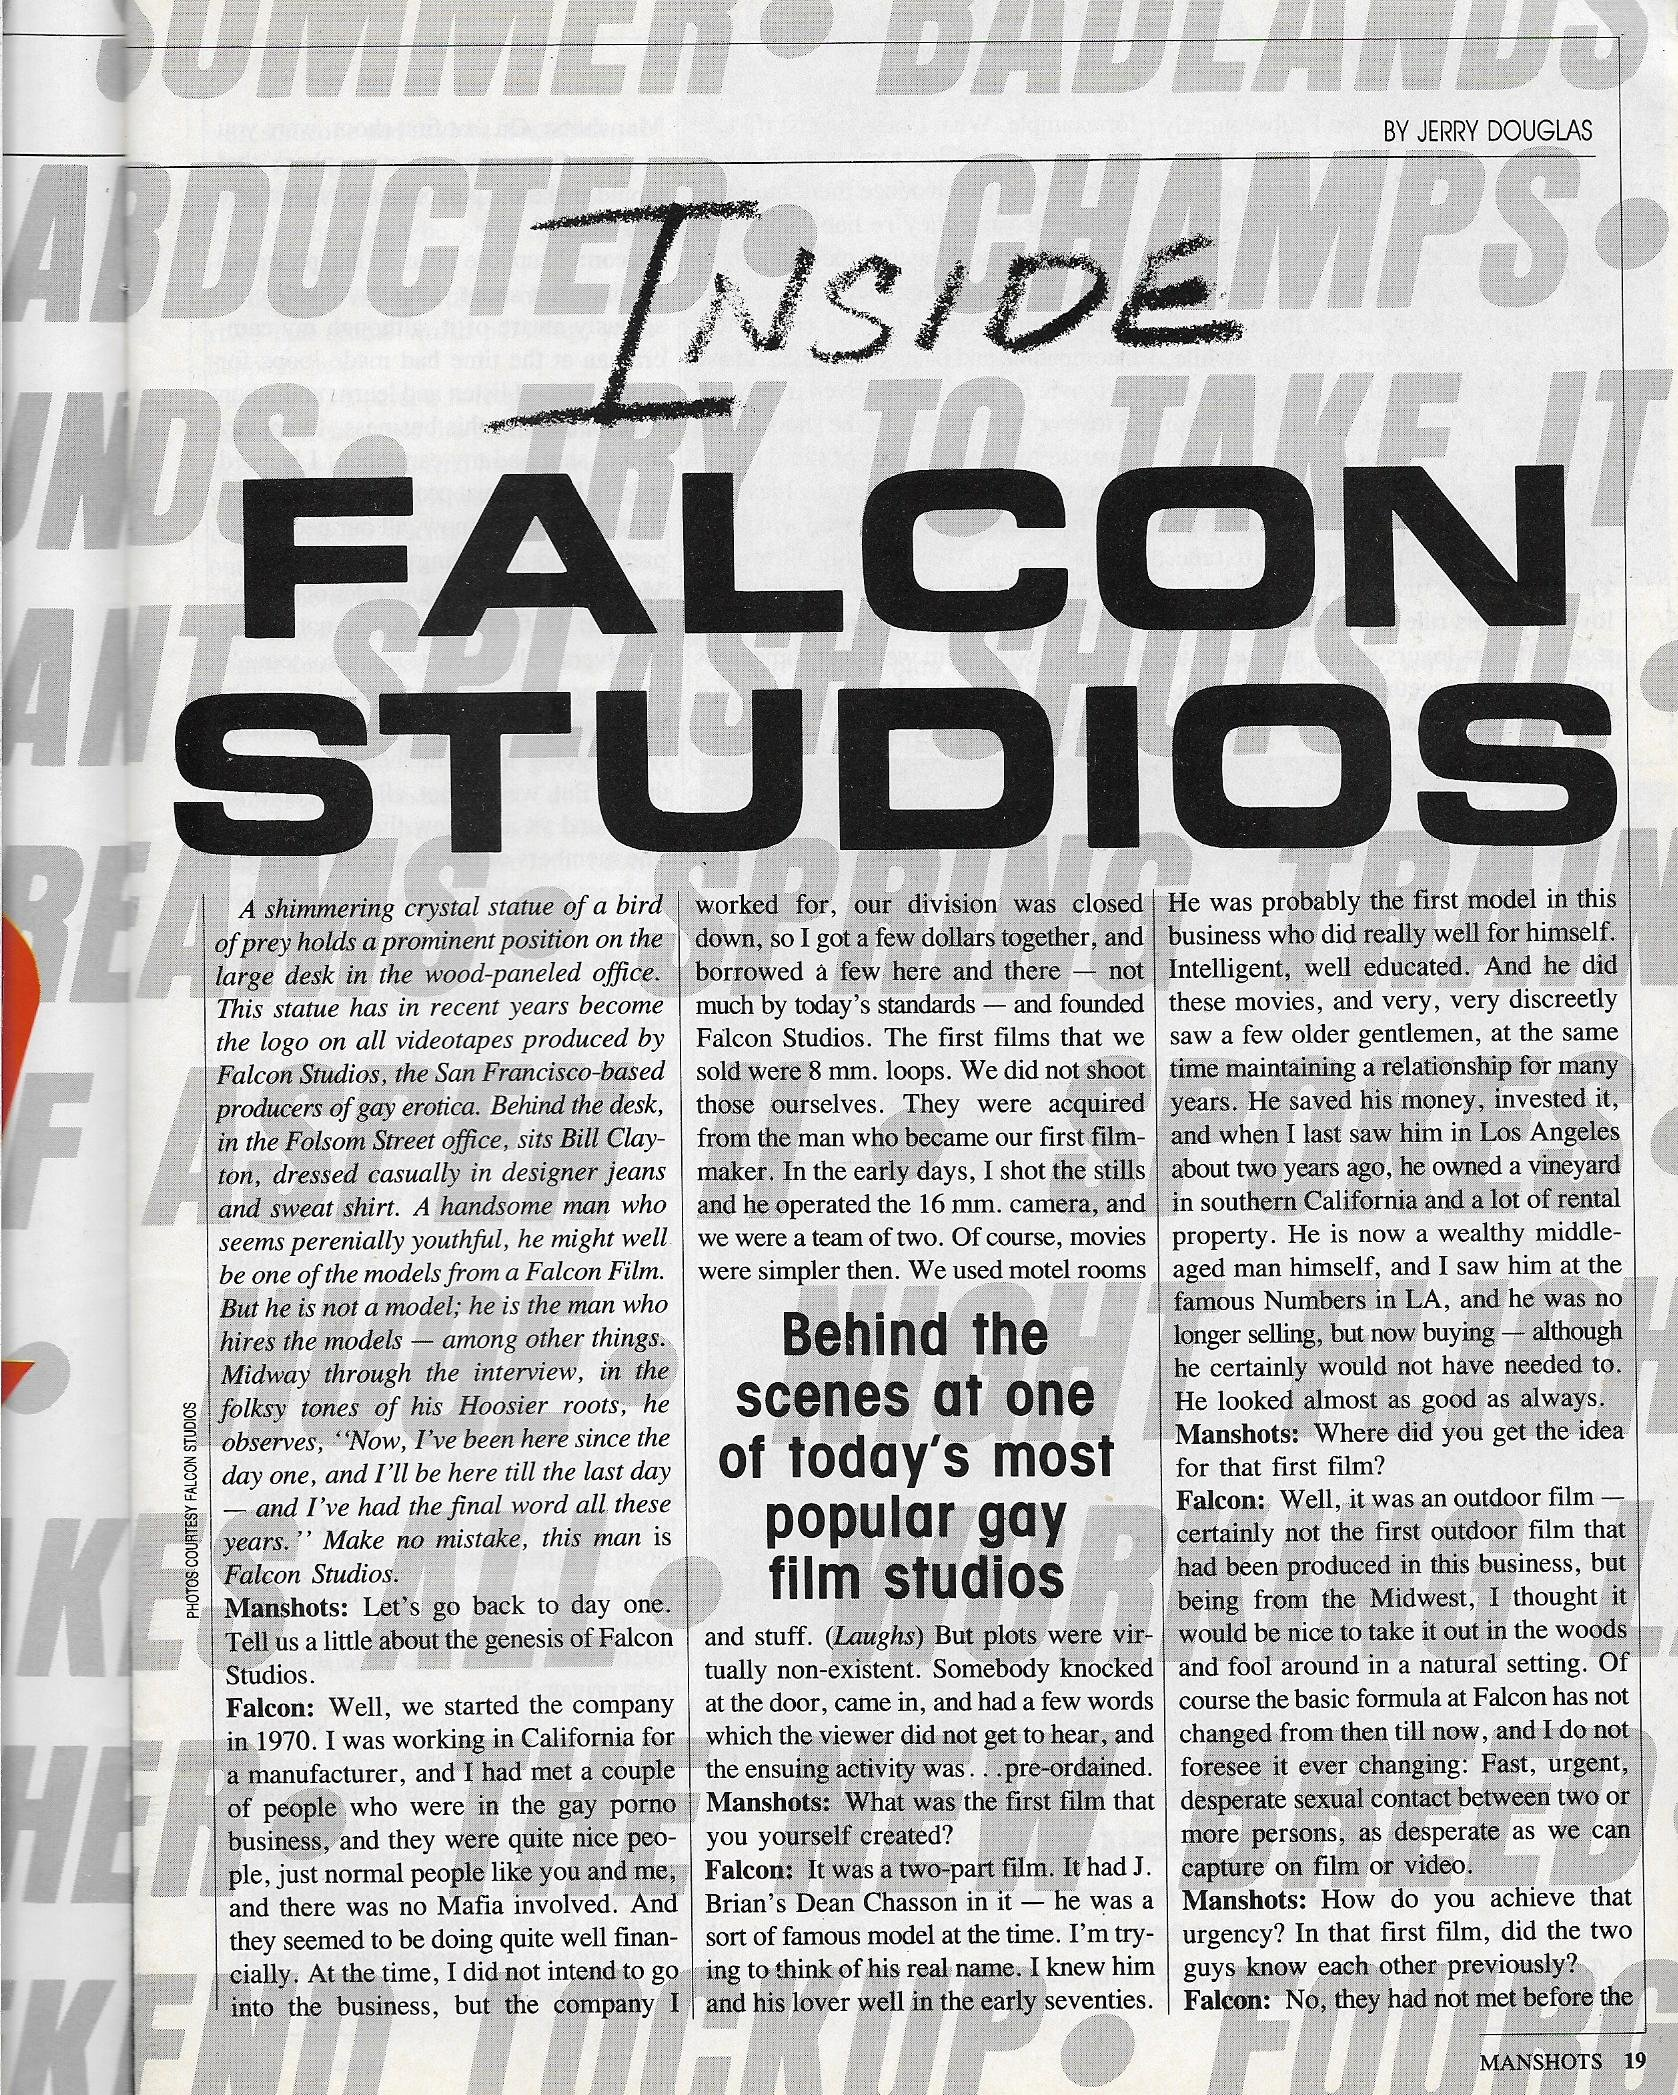 Spokes Ii Scene Falcon Studios